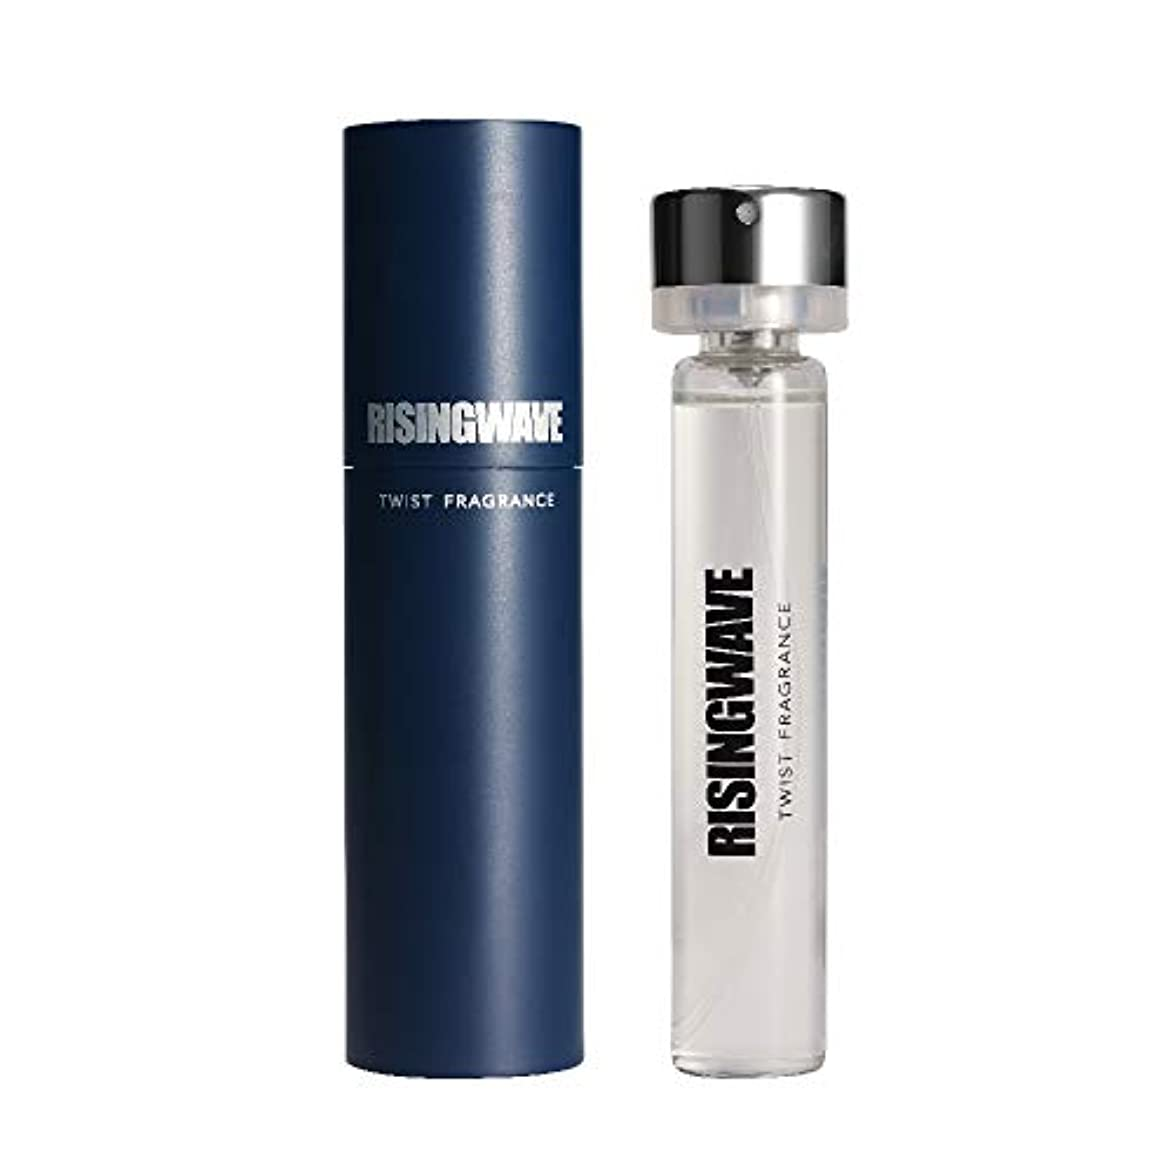 RISINGWAVE(ライジングウェーブ) ライジングウェーブ ツイストフレグランス(トランスオーシャン) 携帯ケース+詰め替え用ボトル20ml